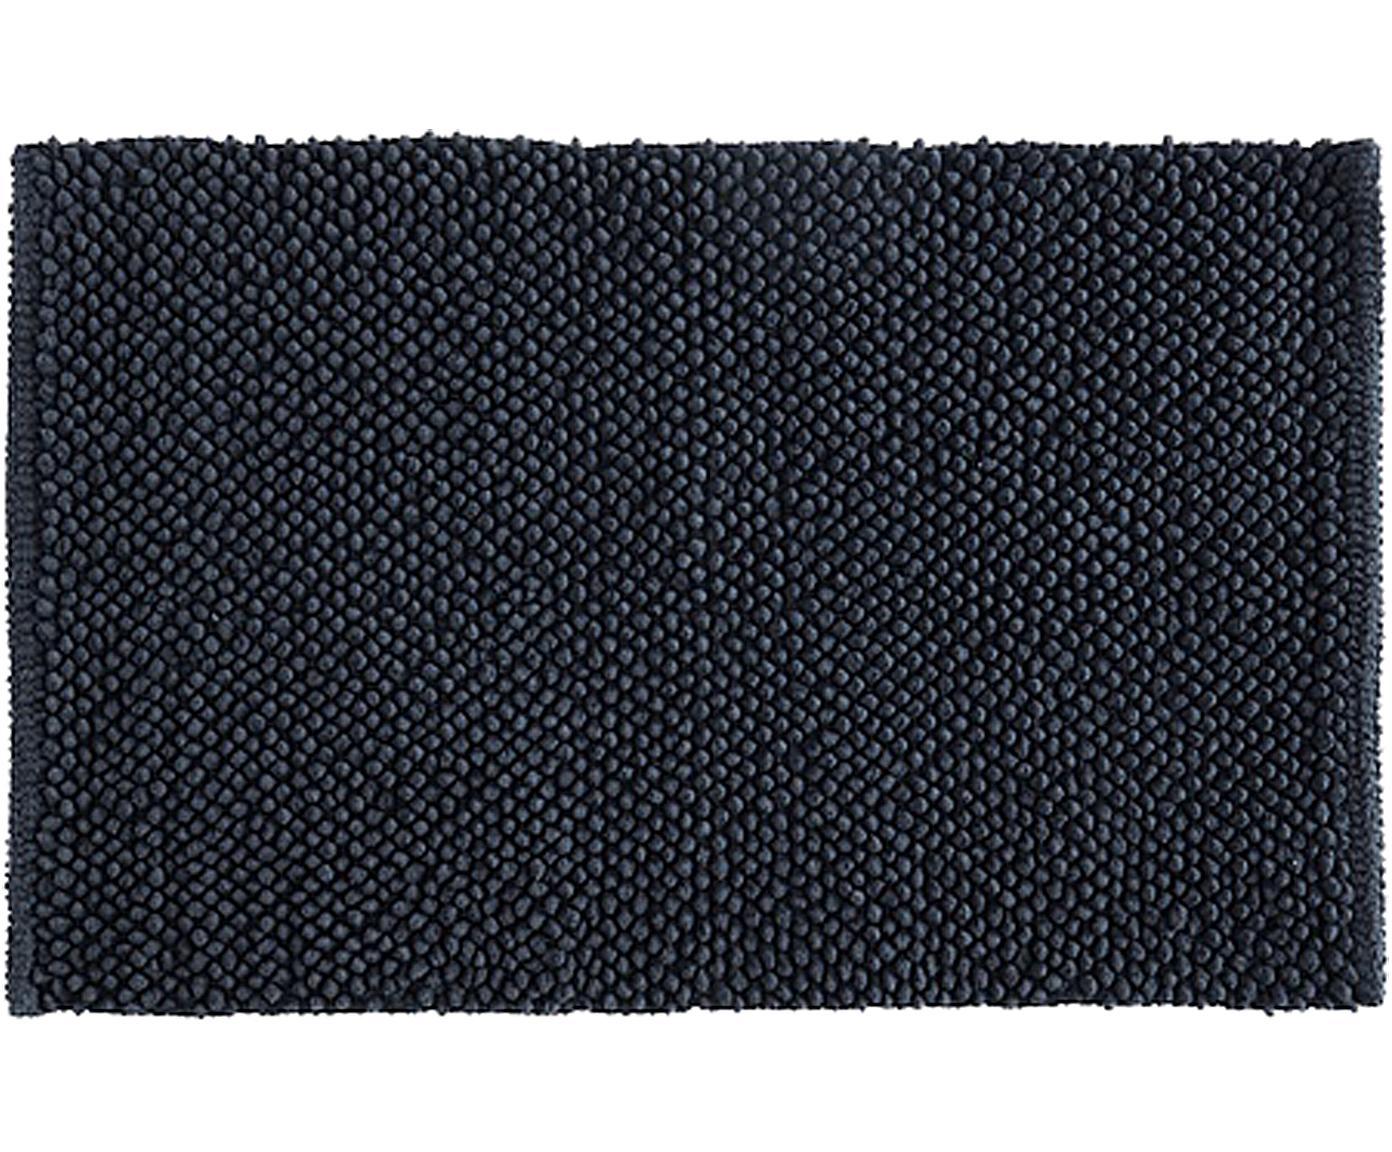 Badmat Anja in zwart, Katoen, Zwart, 50 x 80 cm